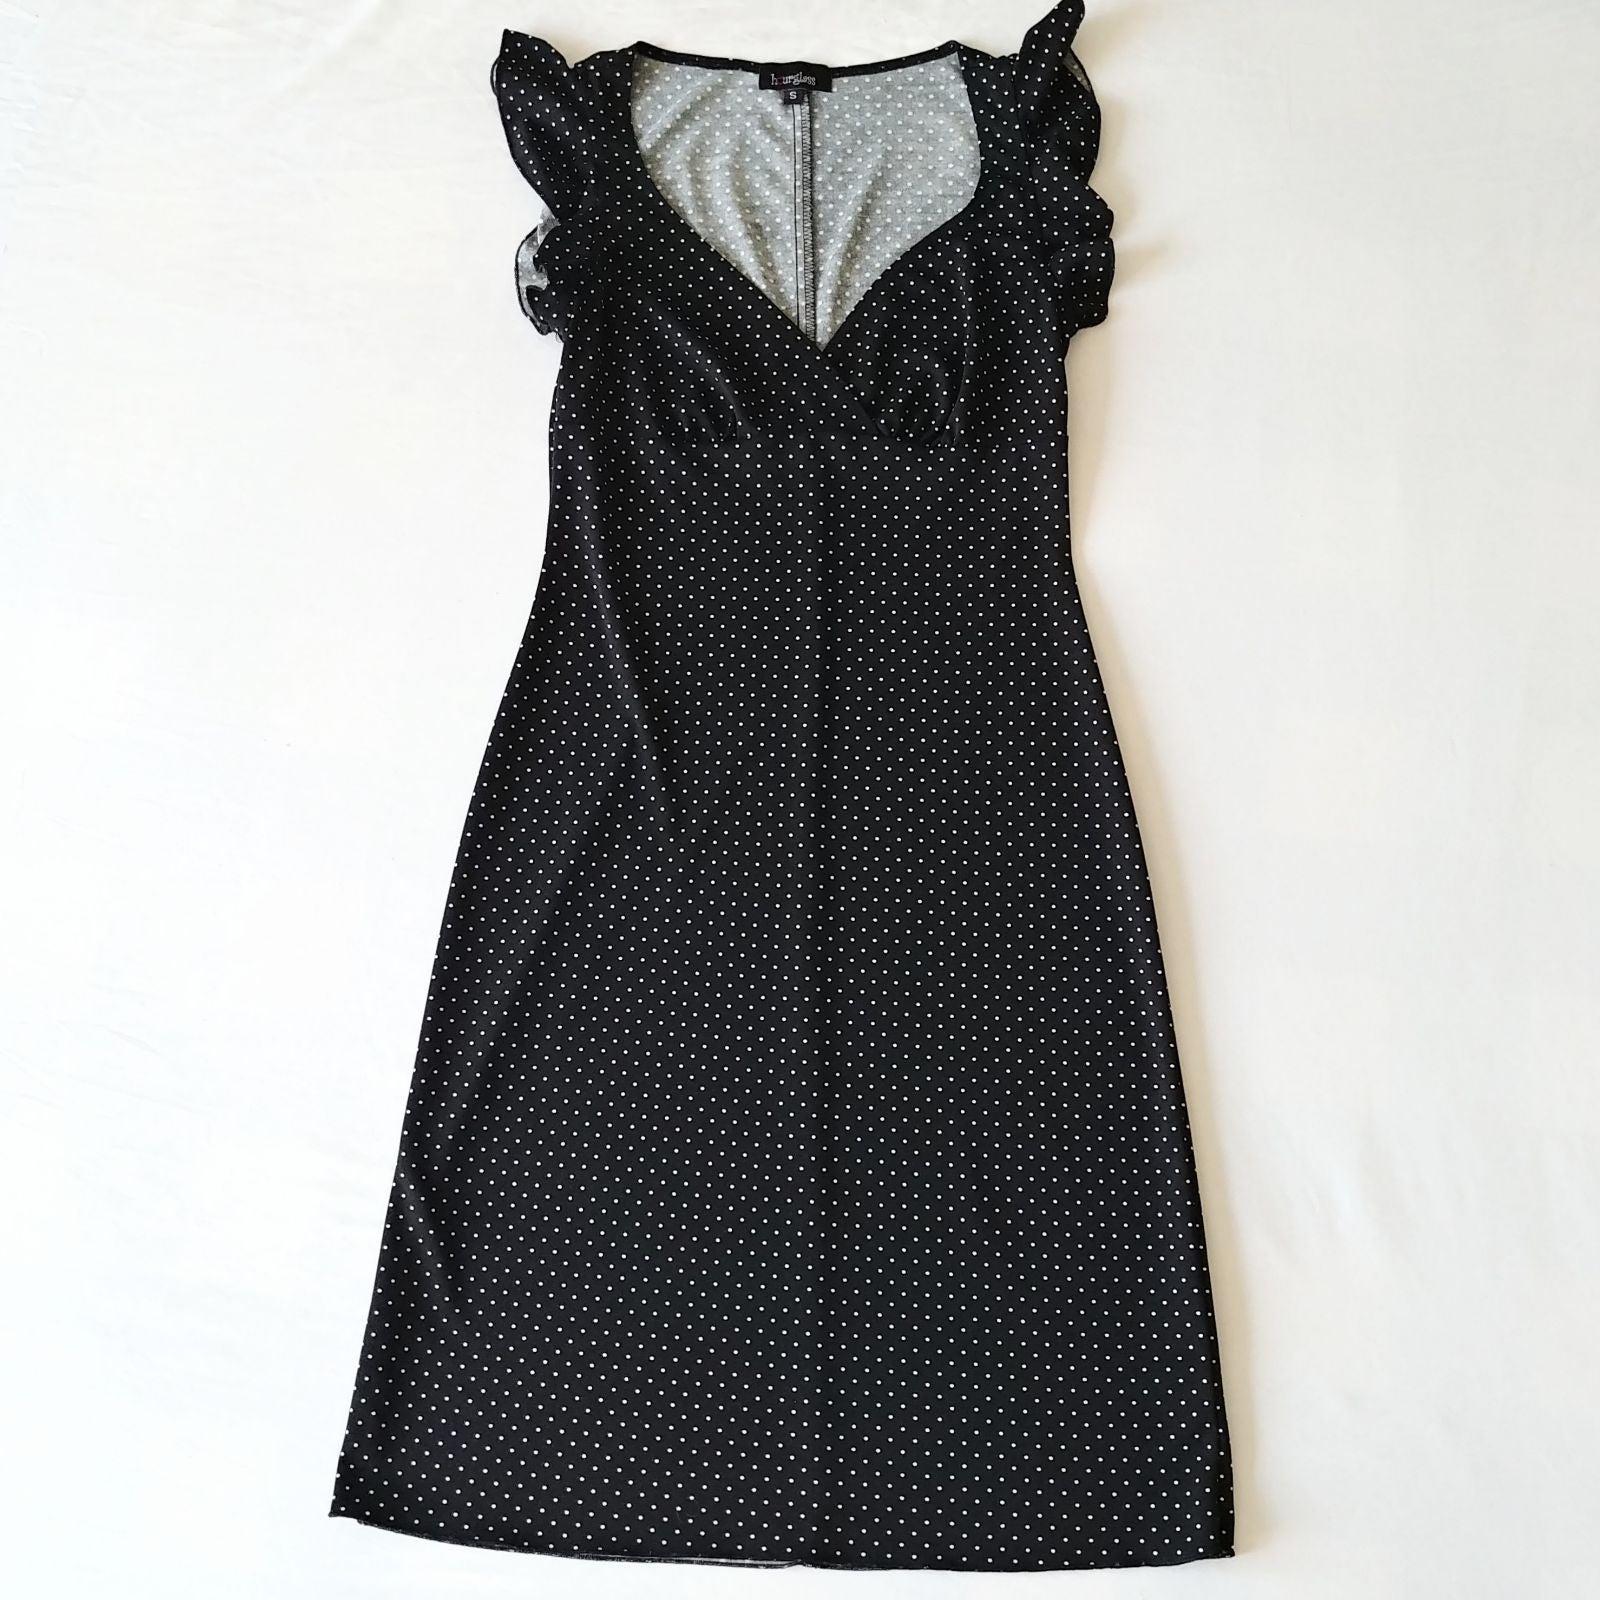 Hourglass Black Polka Dot Dress